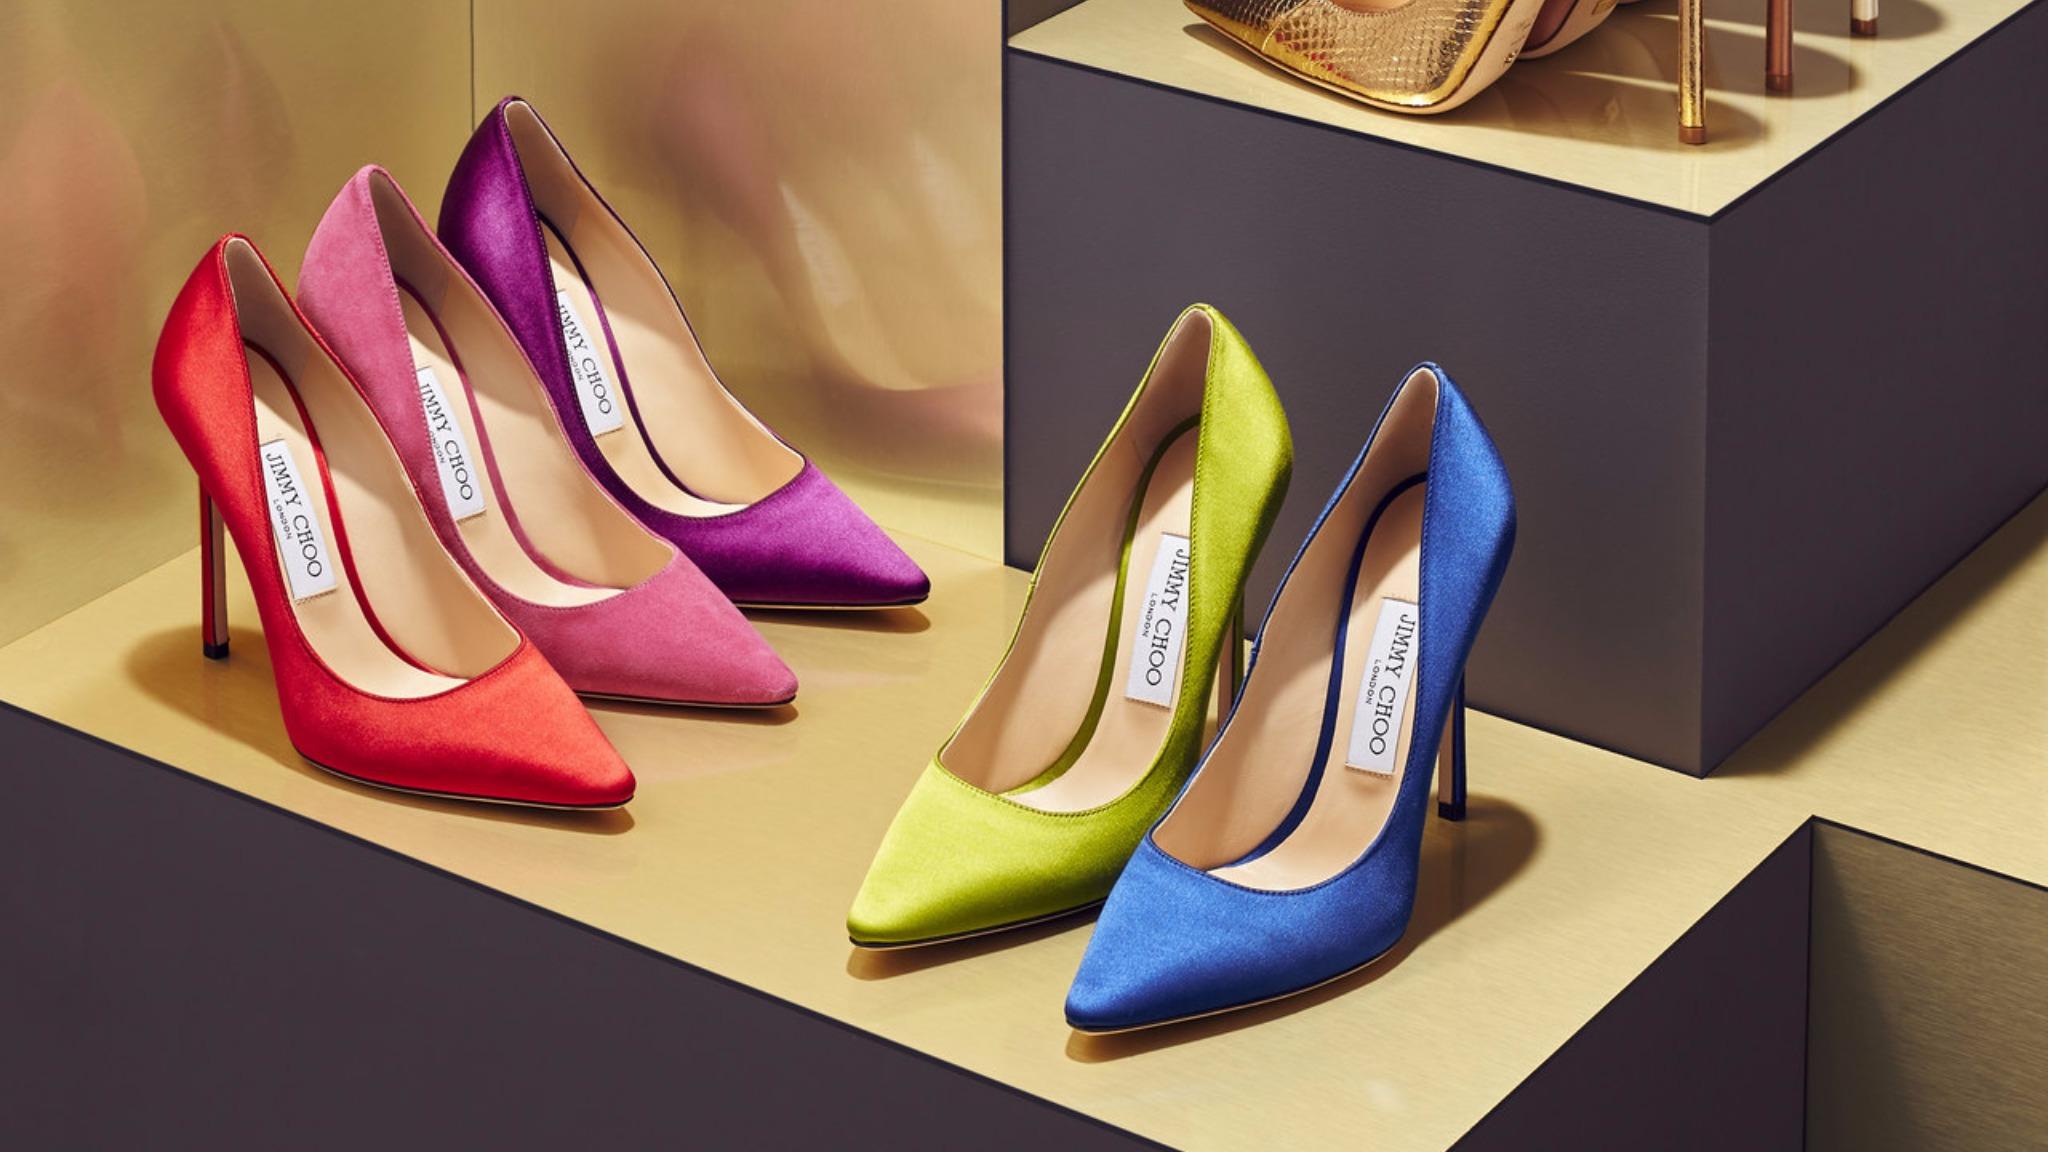 464bb0c1686 Jimmy Choo Luxury Shoes